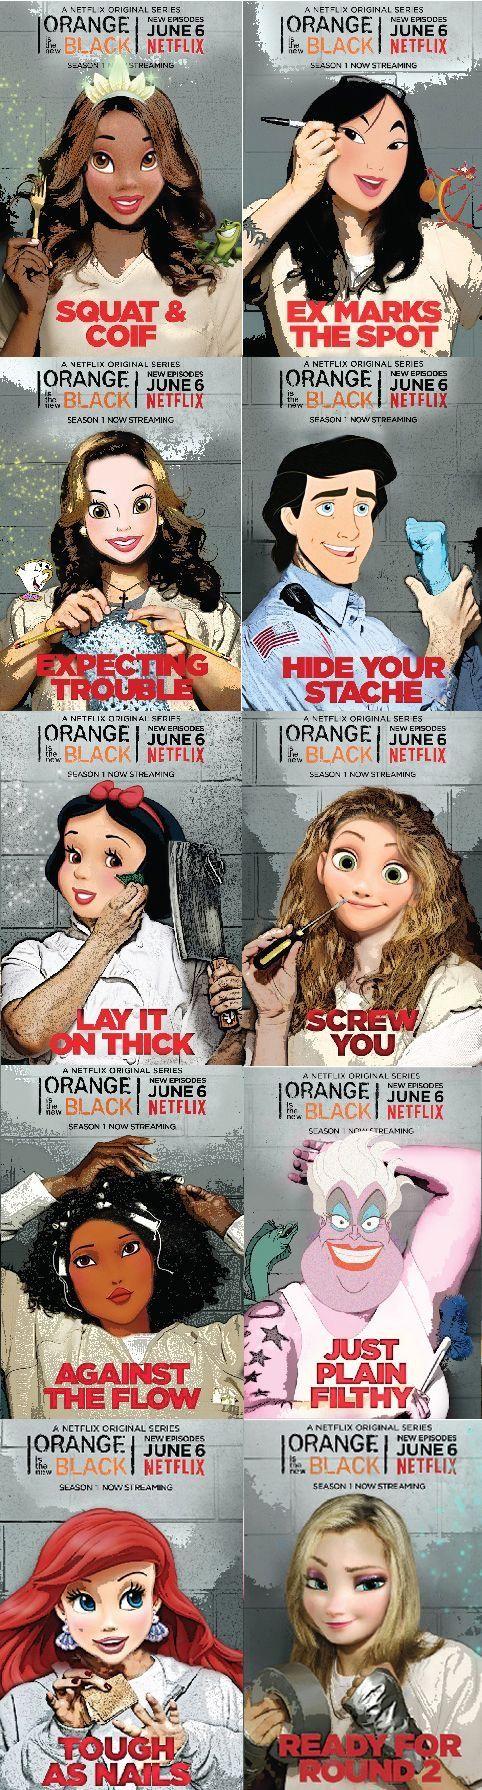 Orange is the new Black as Disney characters